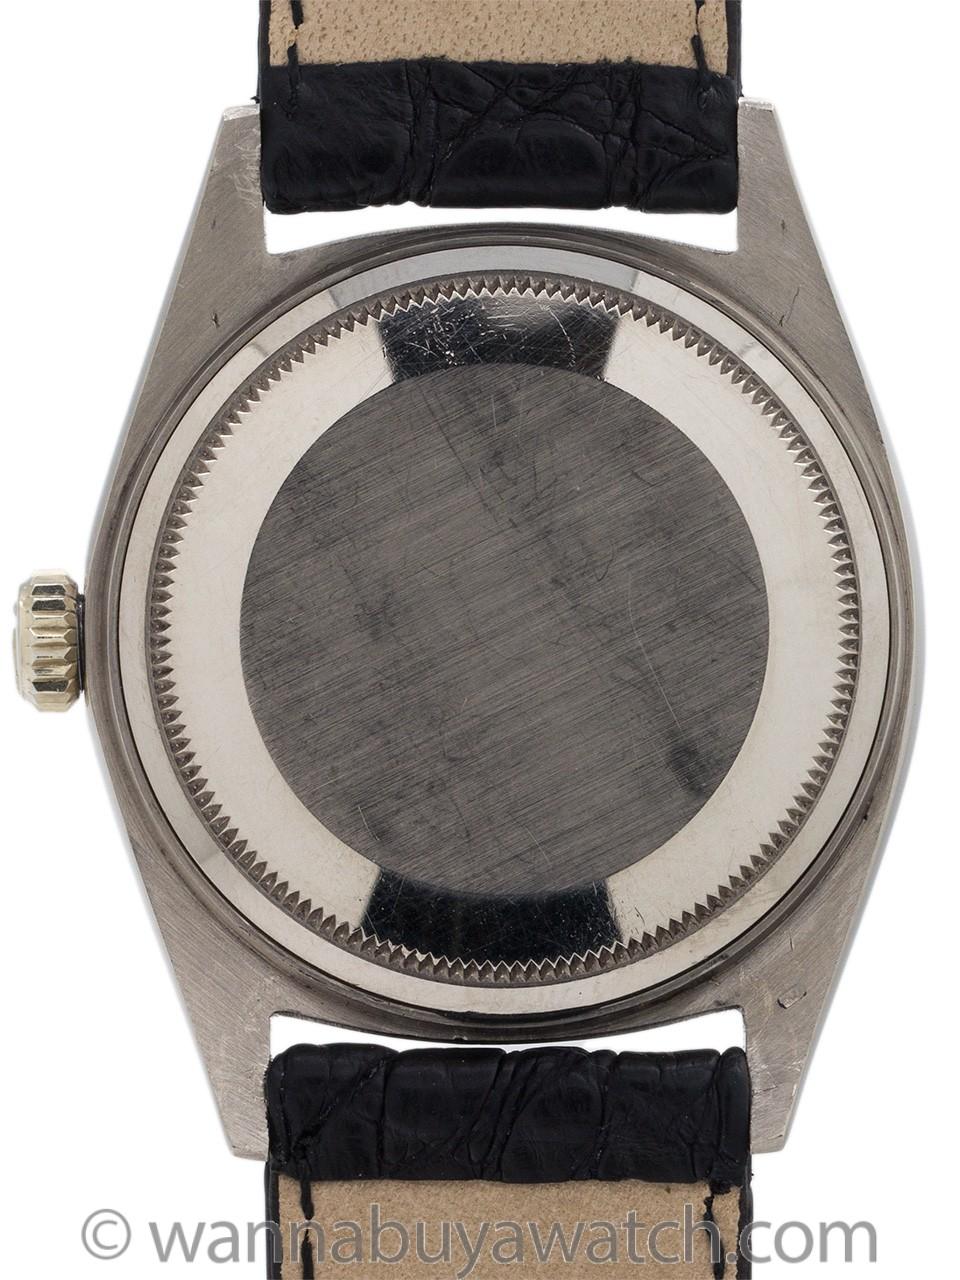 Rolex Day Date President ref 1803 18K WG circa 1966 MINT!